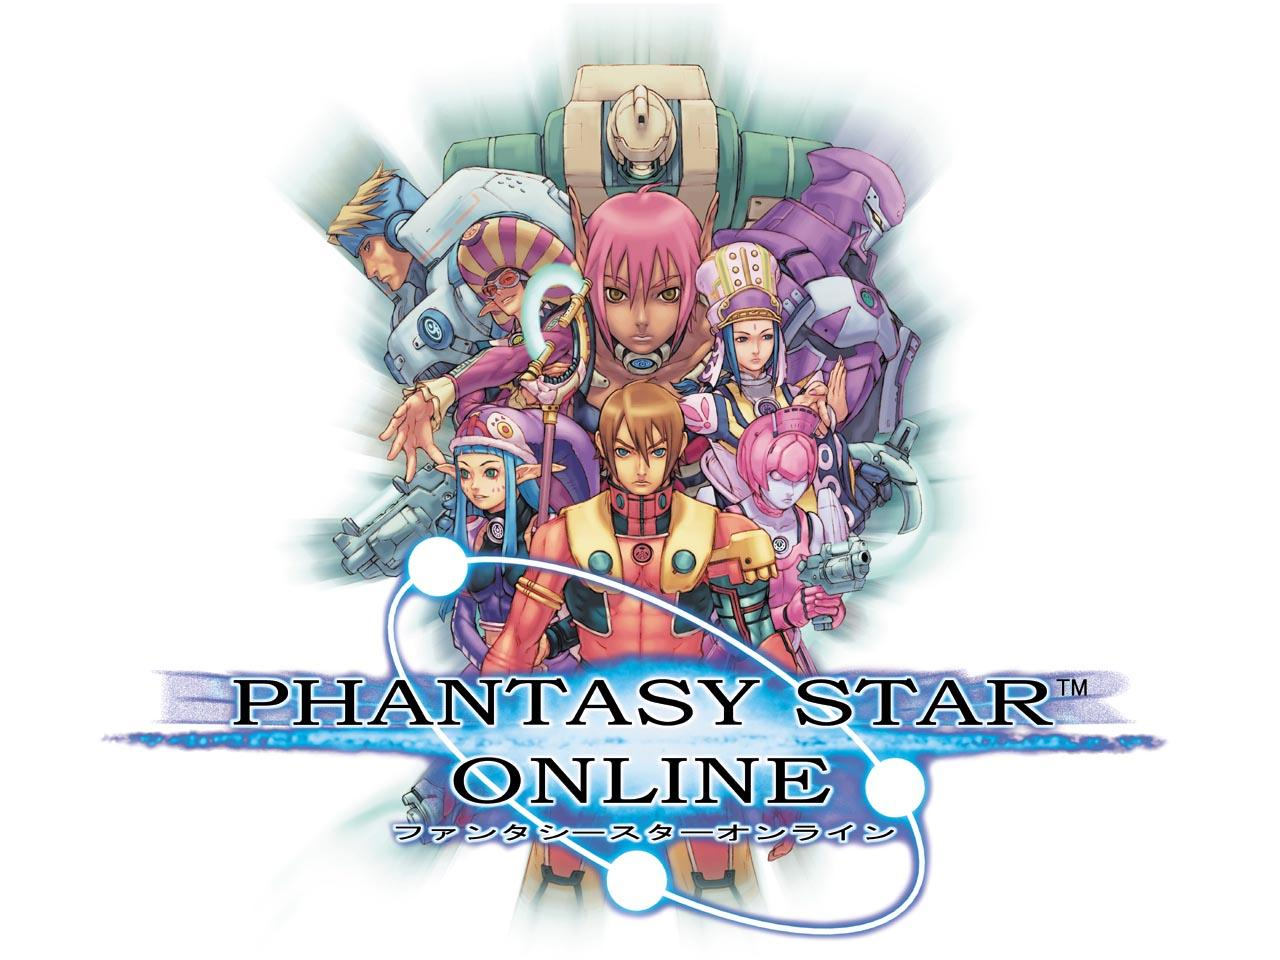 phantasy star online (series) | phantasy star wiki | fandom powered